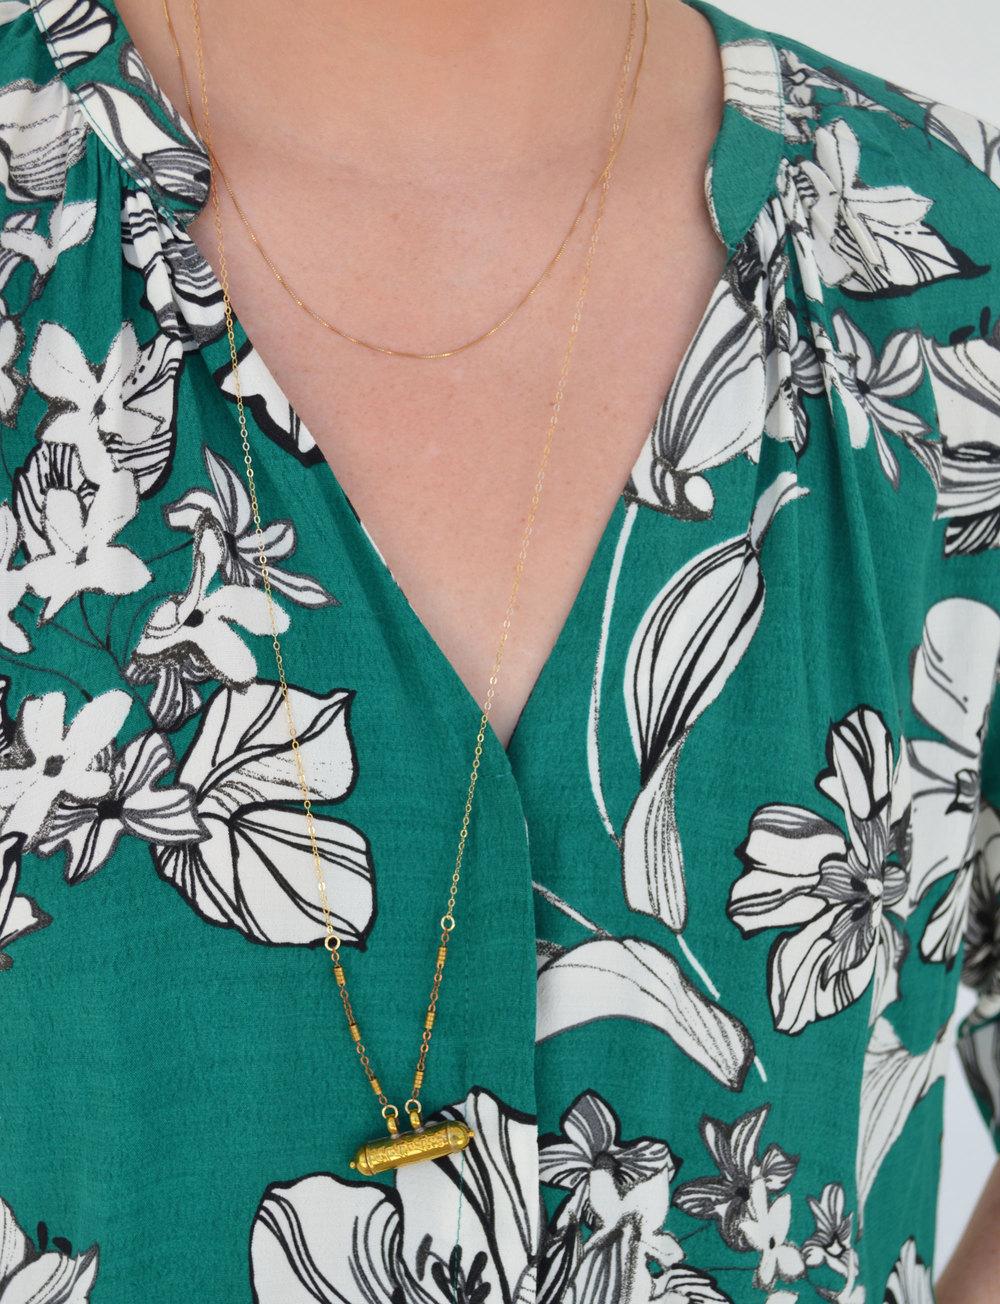 zara-green-printed-jumpsuit-style-blogger-nassau-bahamas.jpeg